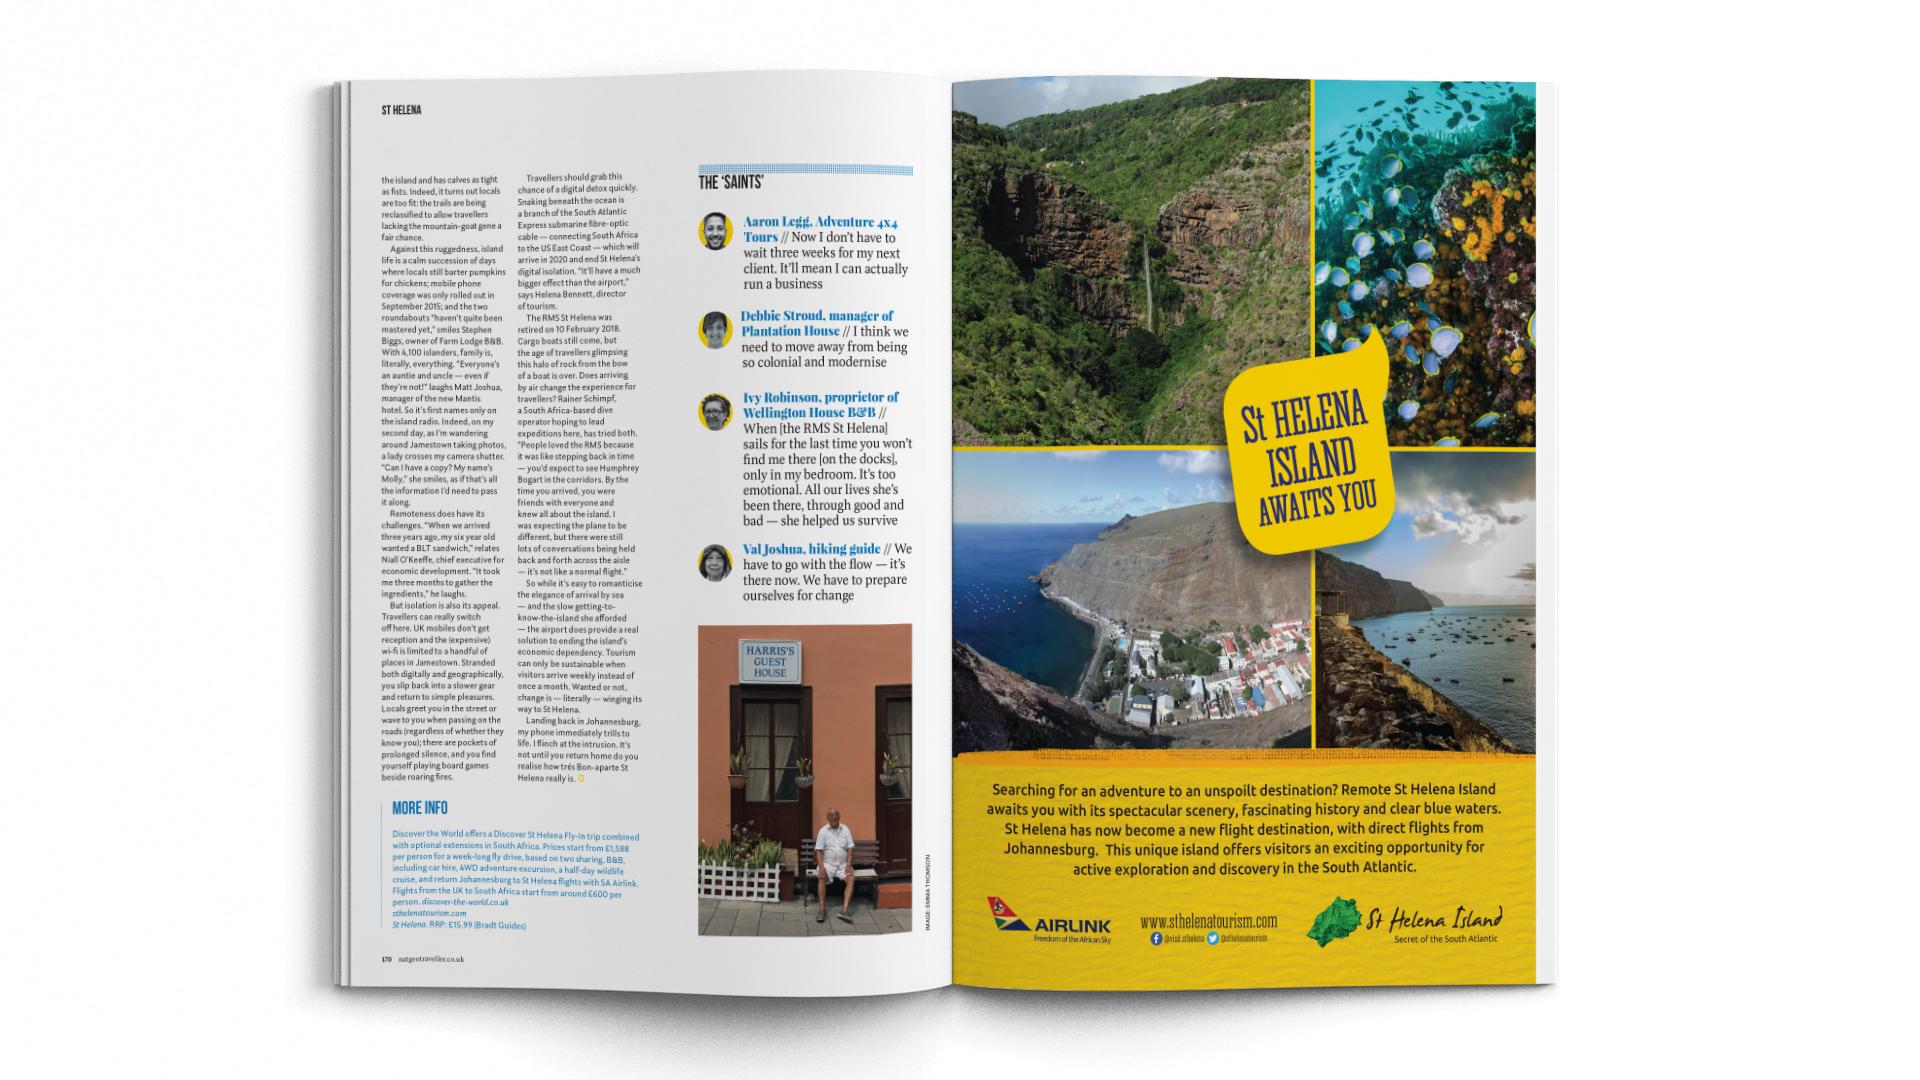 A4-Magazine-DPS-NGT-TT-Report-St-Helena-3